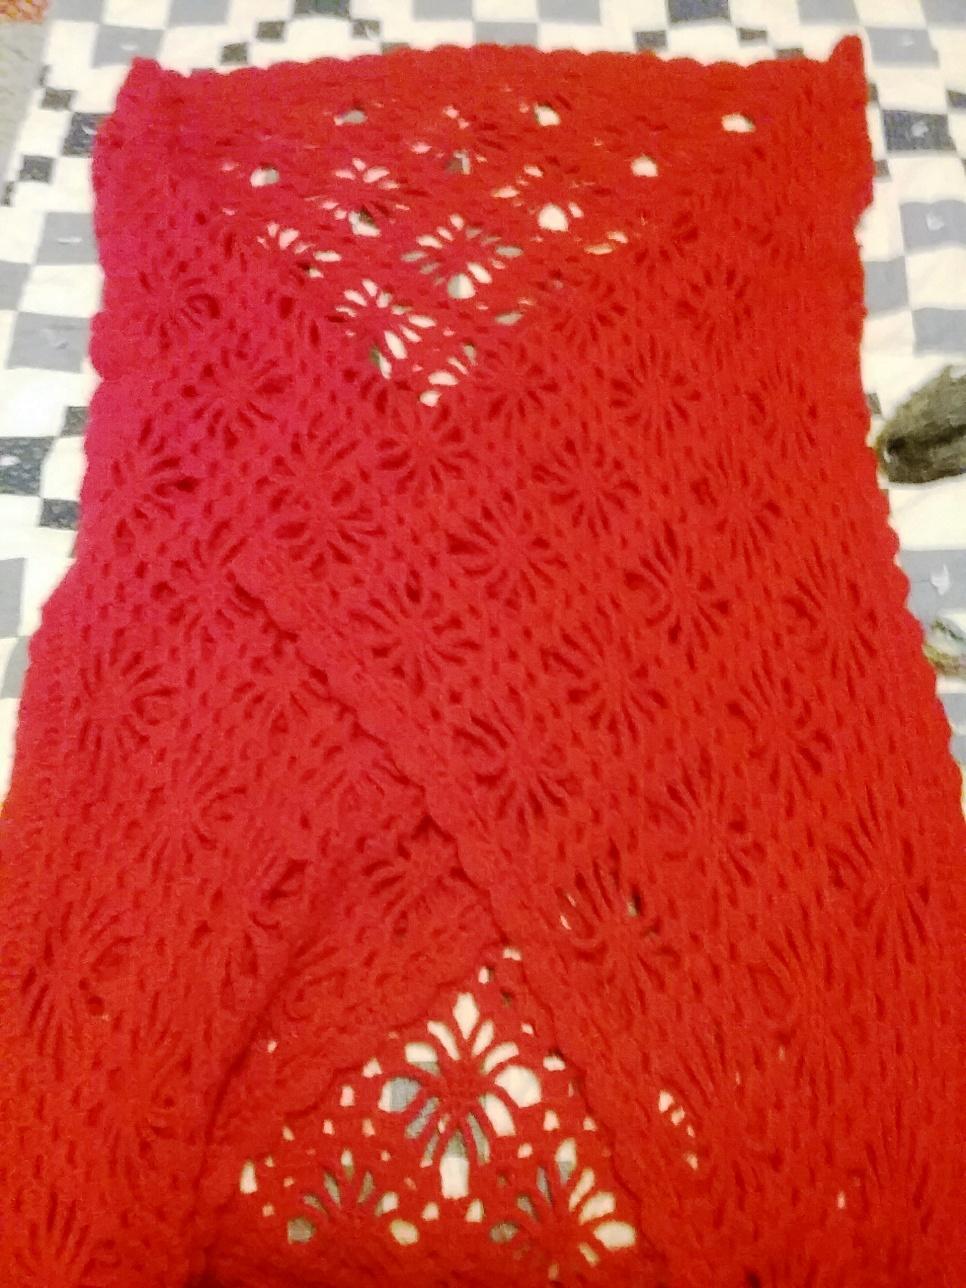 knit and crochet4.jpg